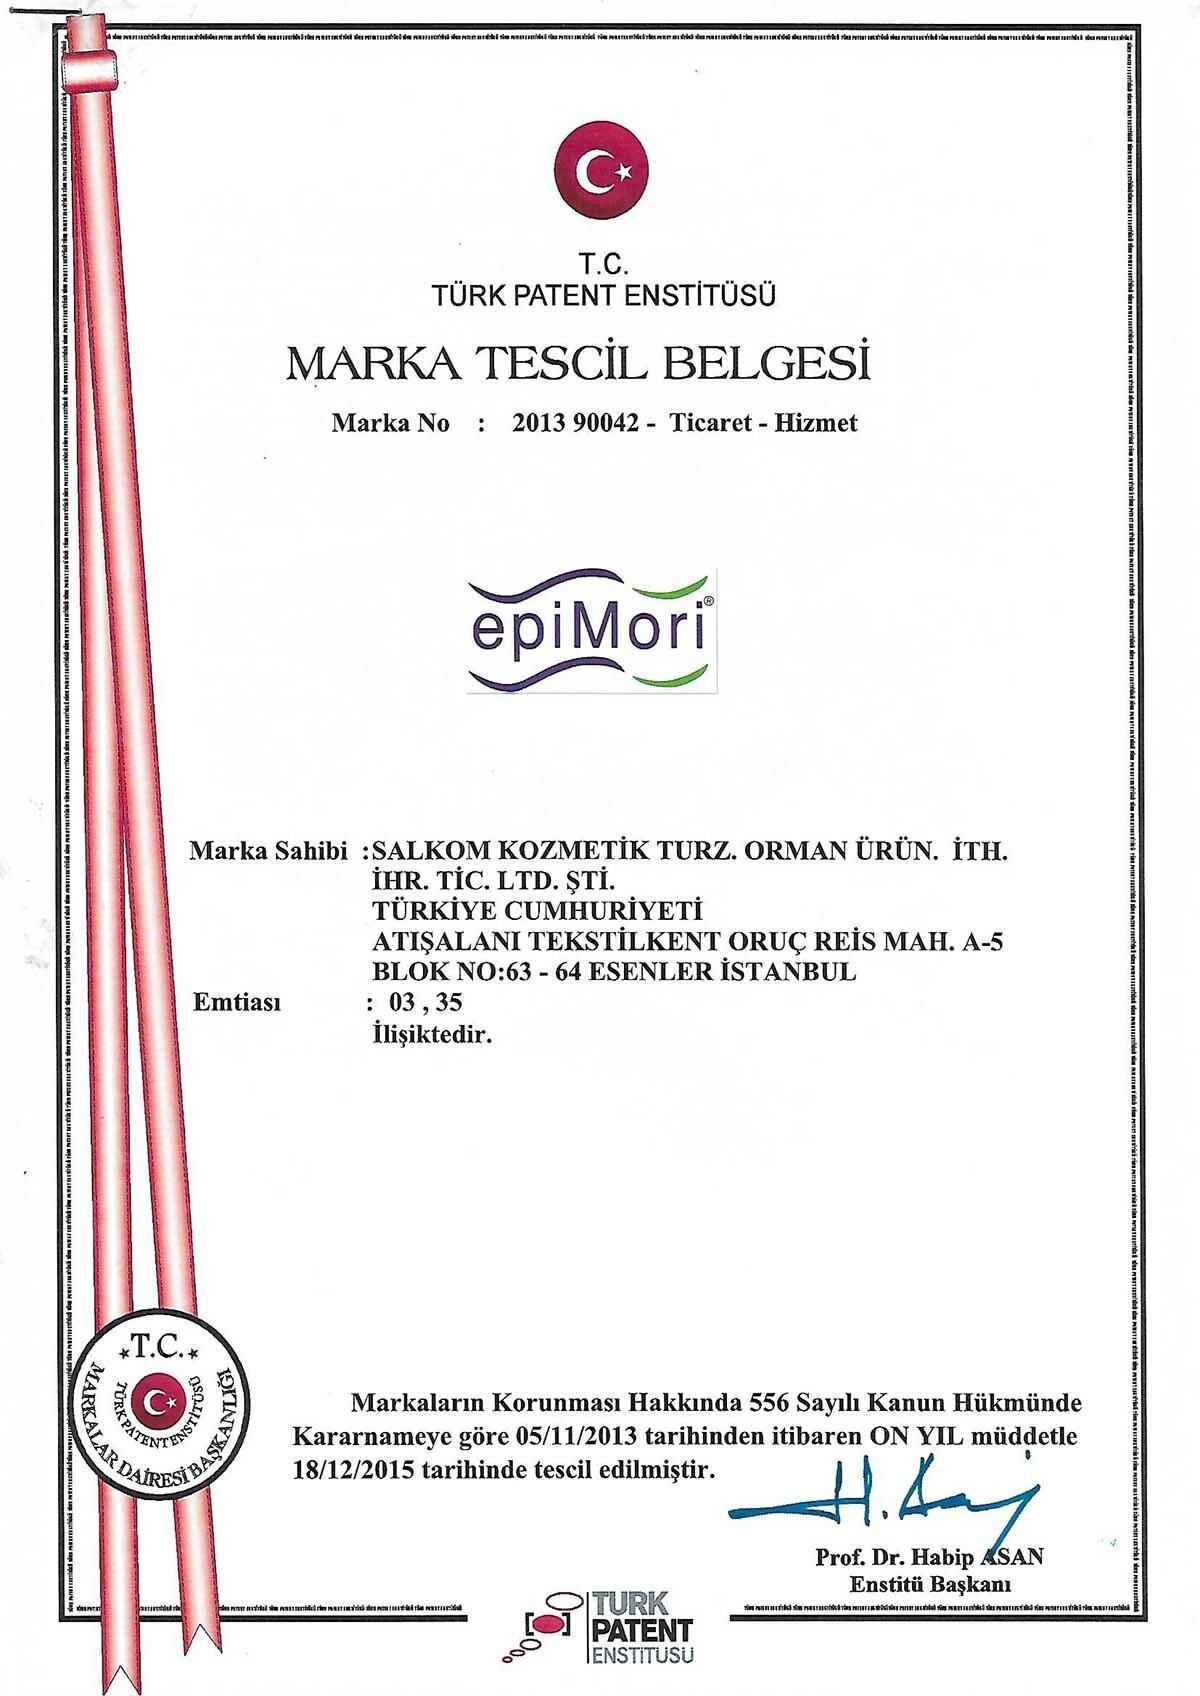 epiMori Marka Tescili